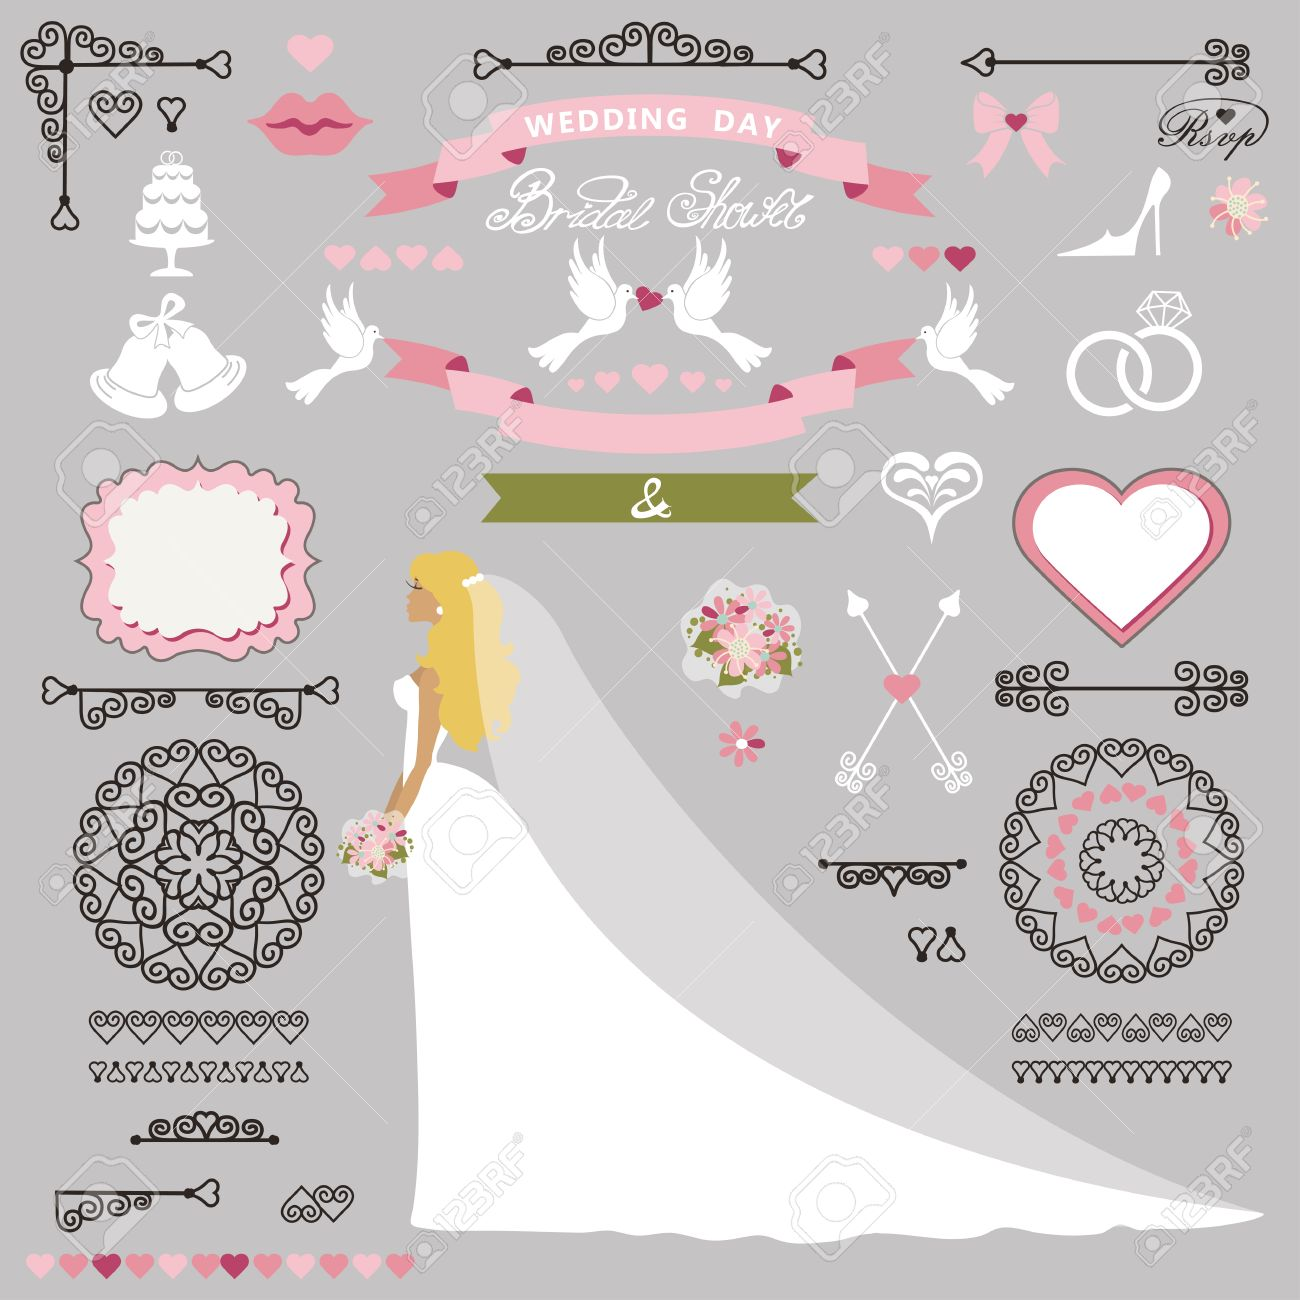 wedding bridal shower invitation card decor setcartoon bride in long dress swirling borders